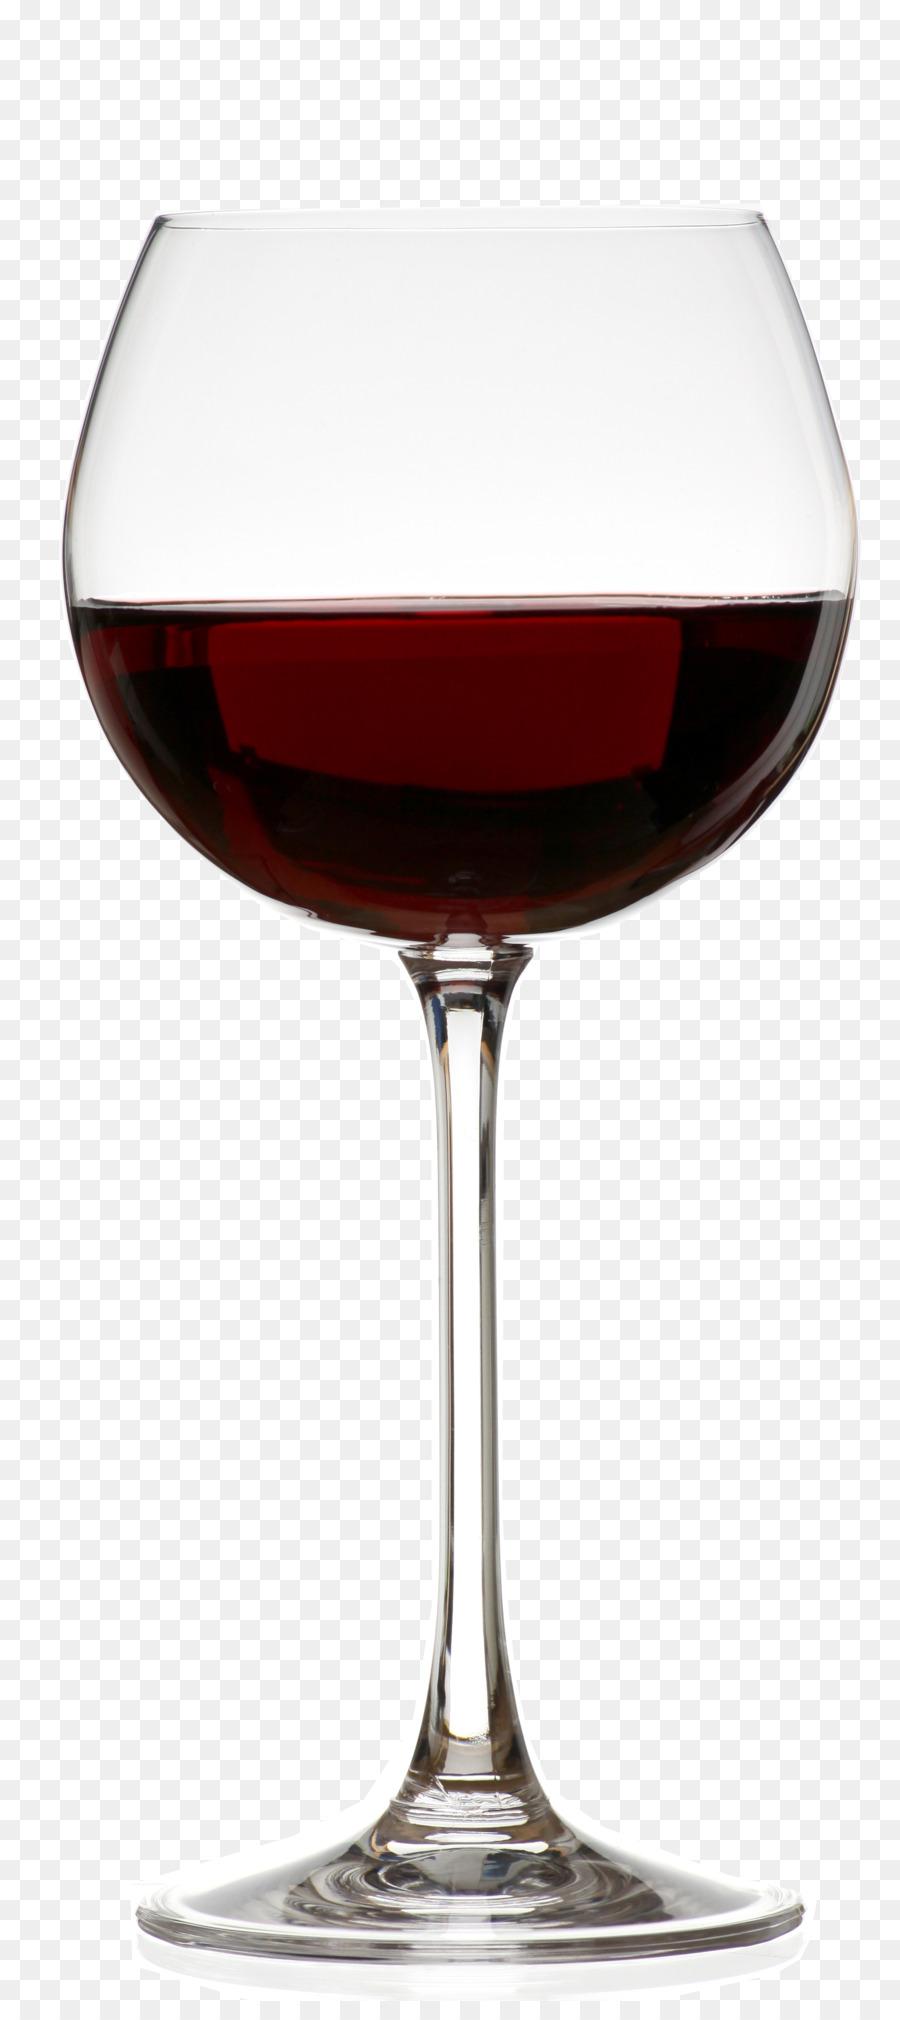 Descarga gratuita de Vino, Cóctel, Vino Tinto Imágen de Png